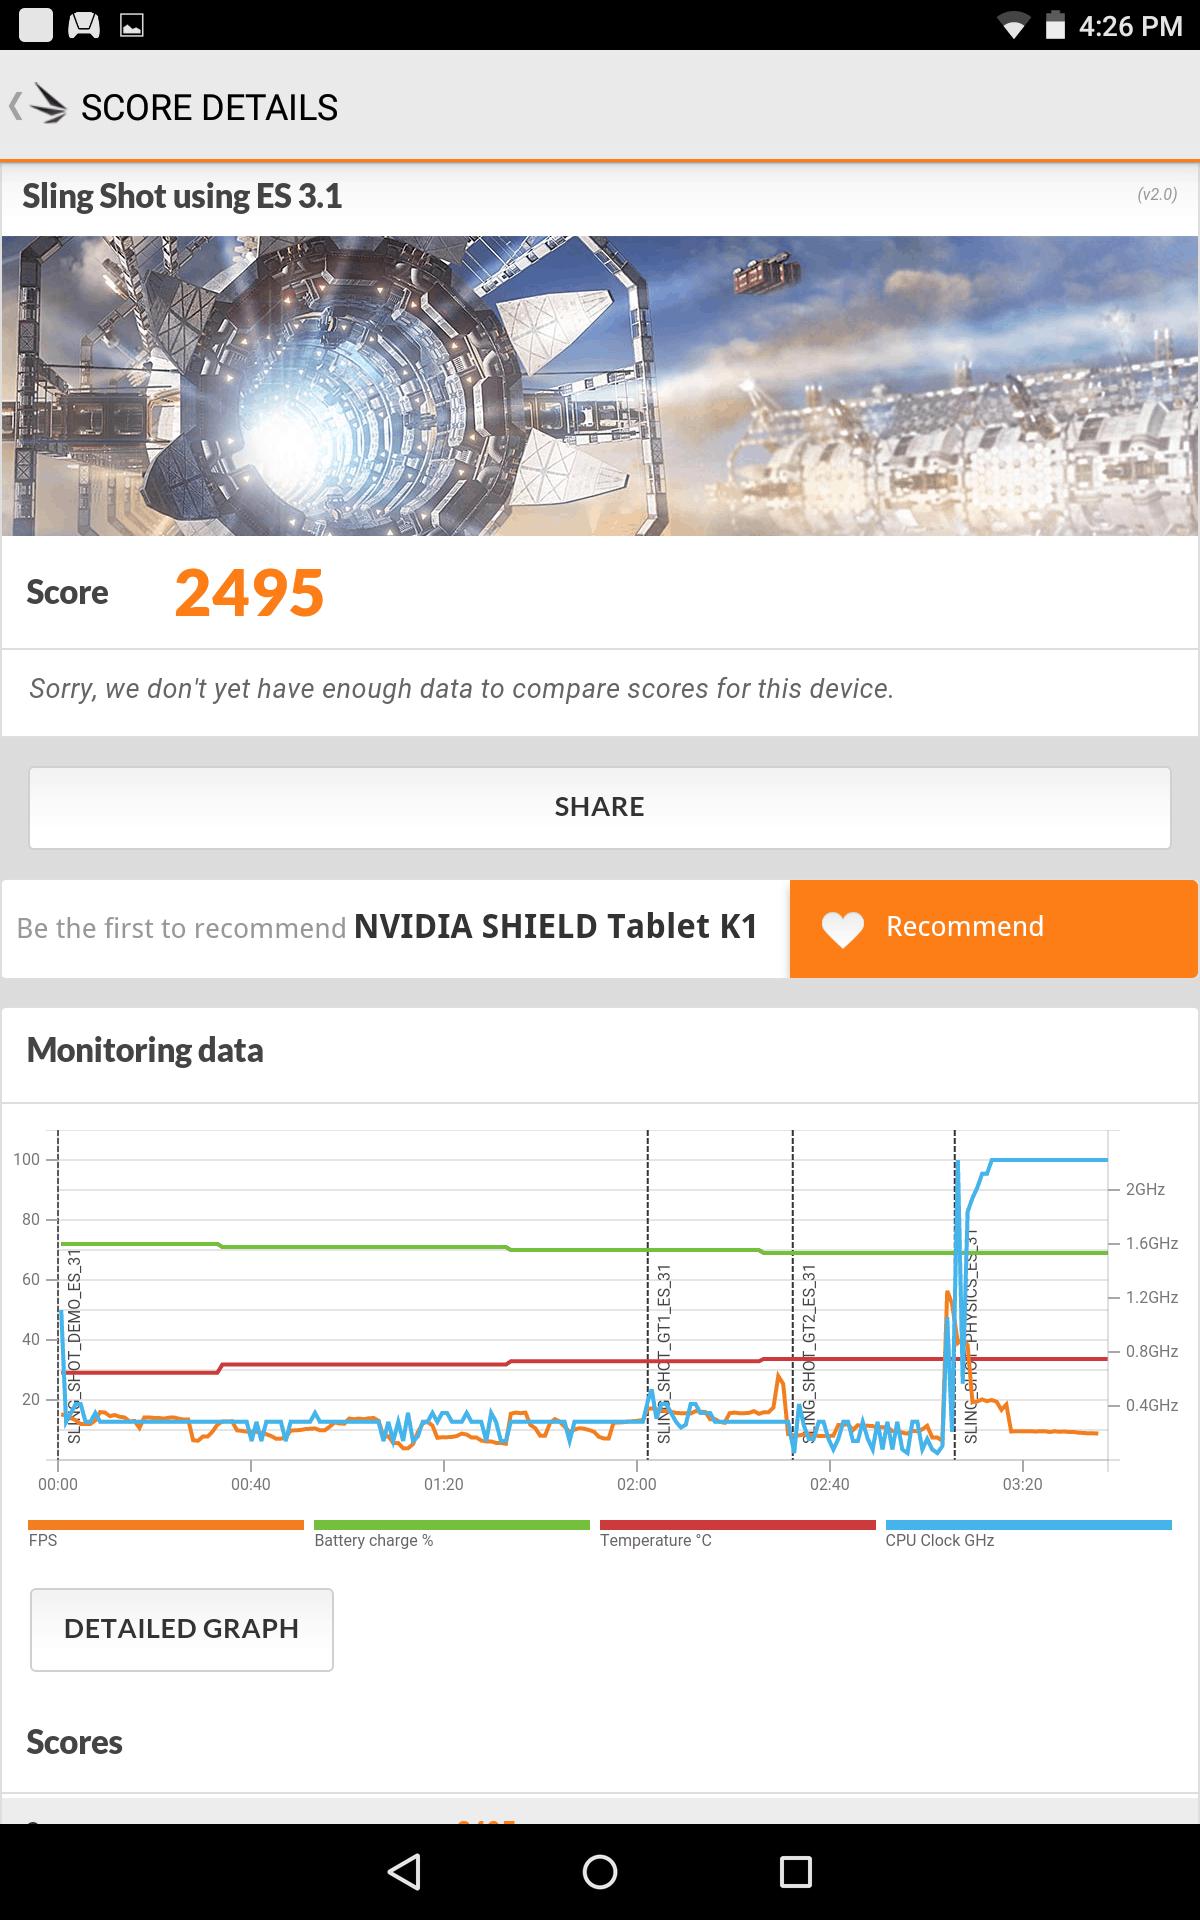 Screenshot 2015 11 13 16 26 53